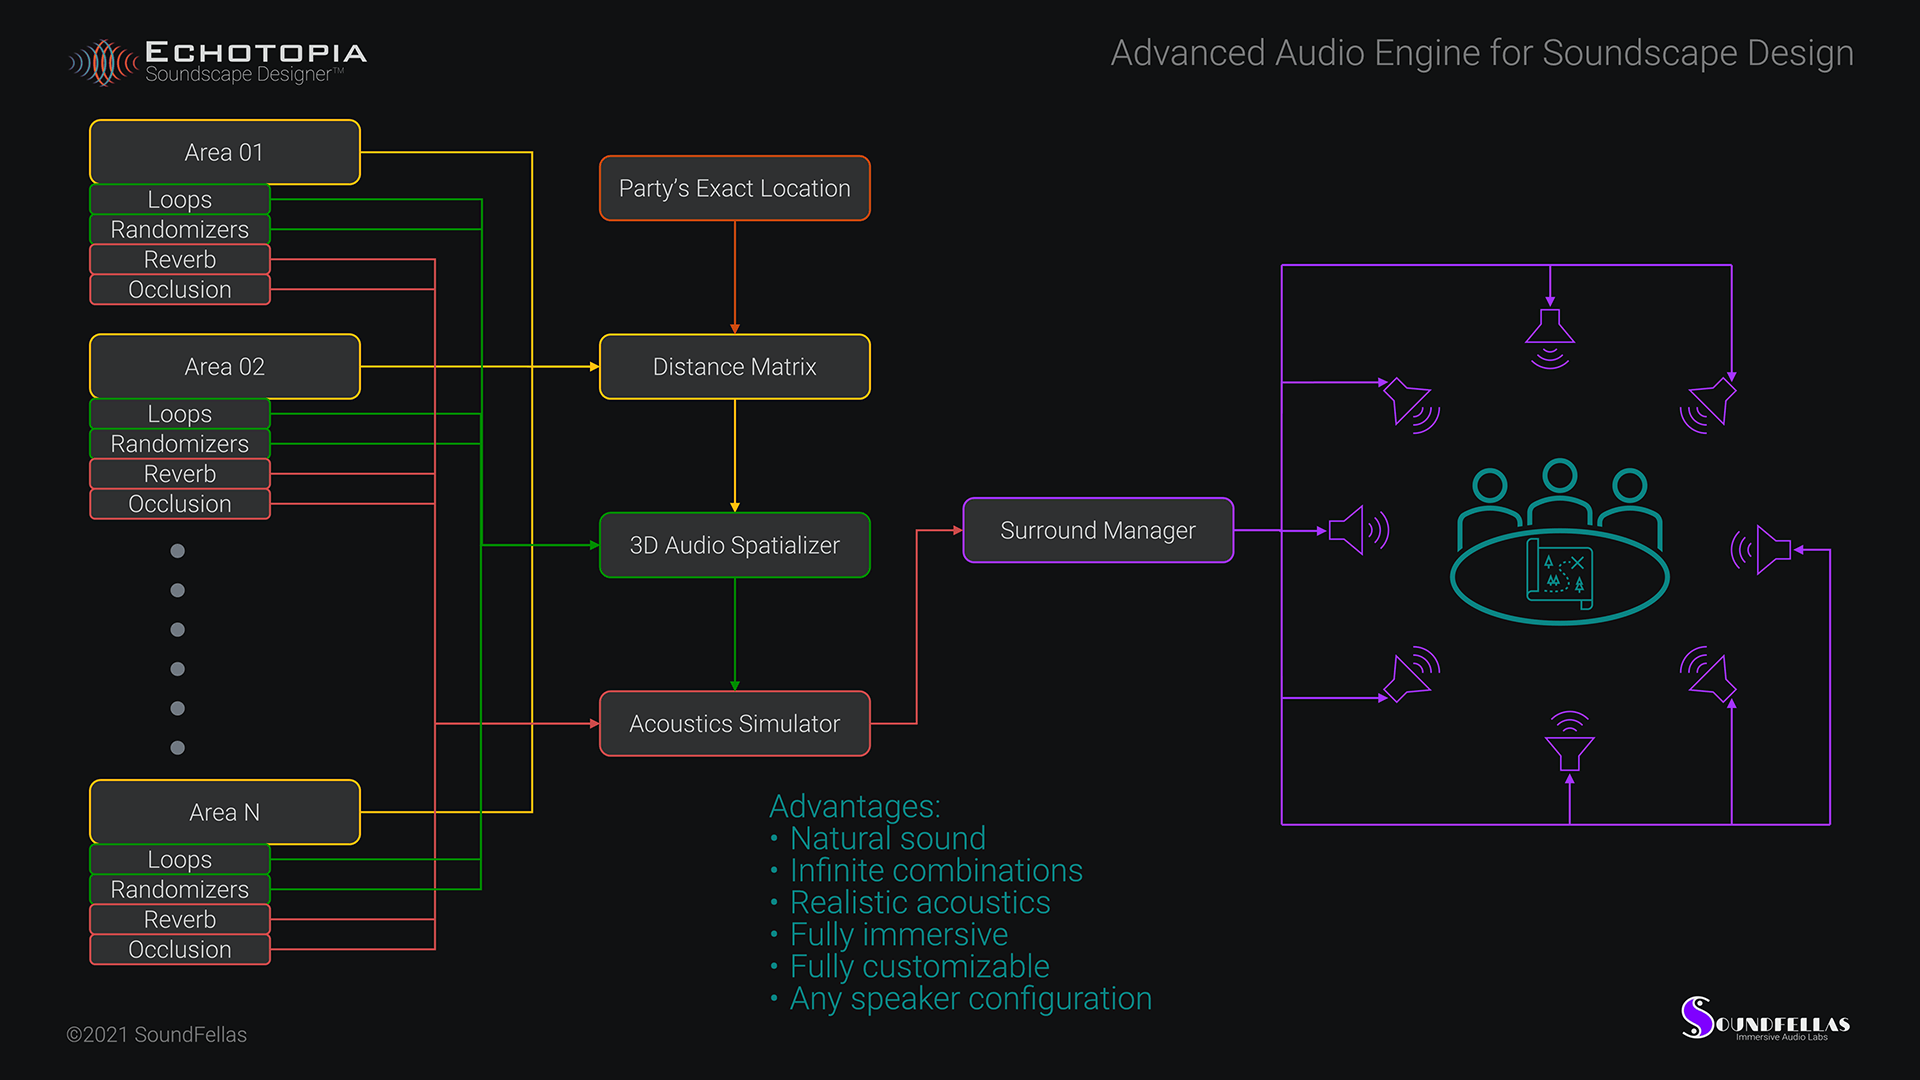 Image of Echotopia Signal Flow of Advanced Audio Engine for Soundscape Design Web.